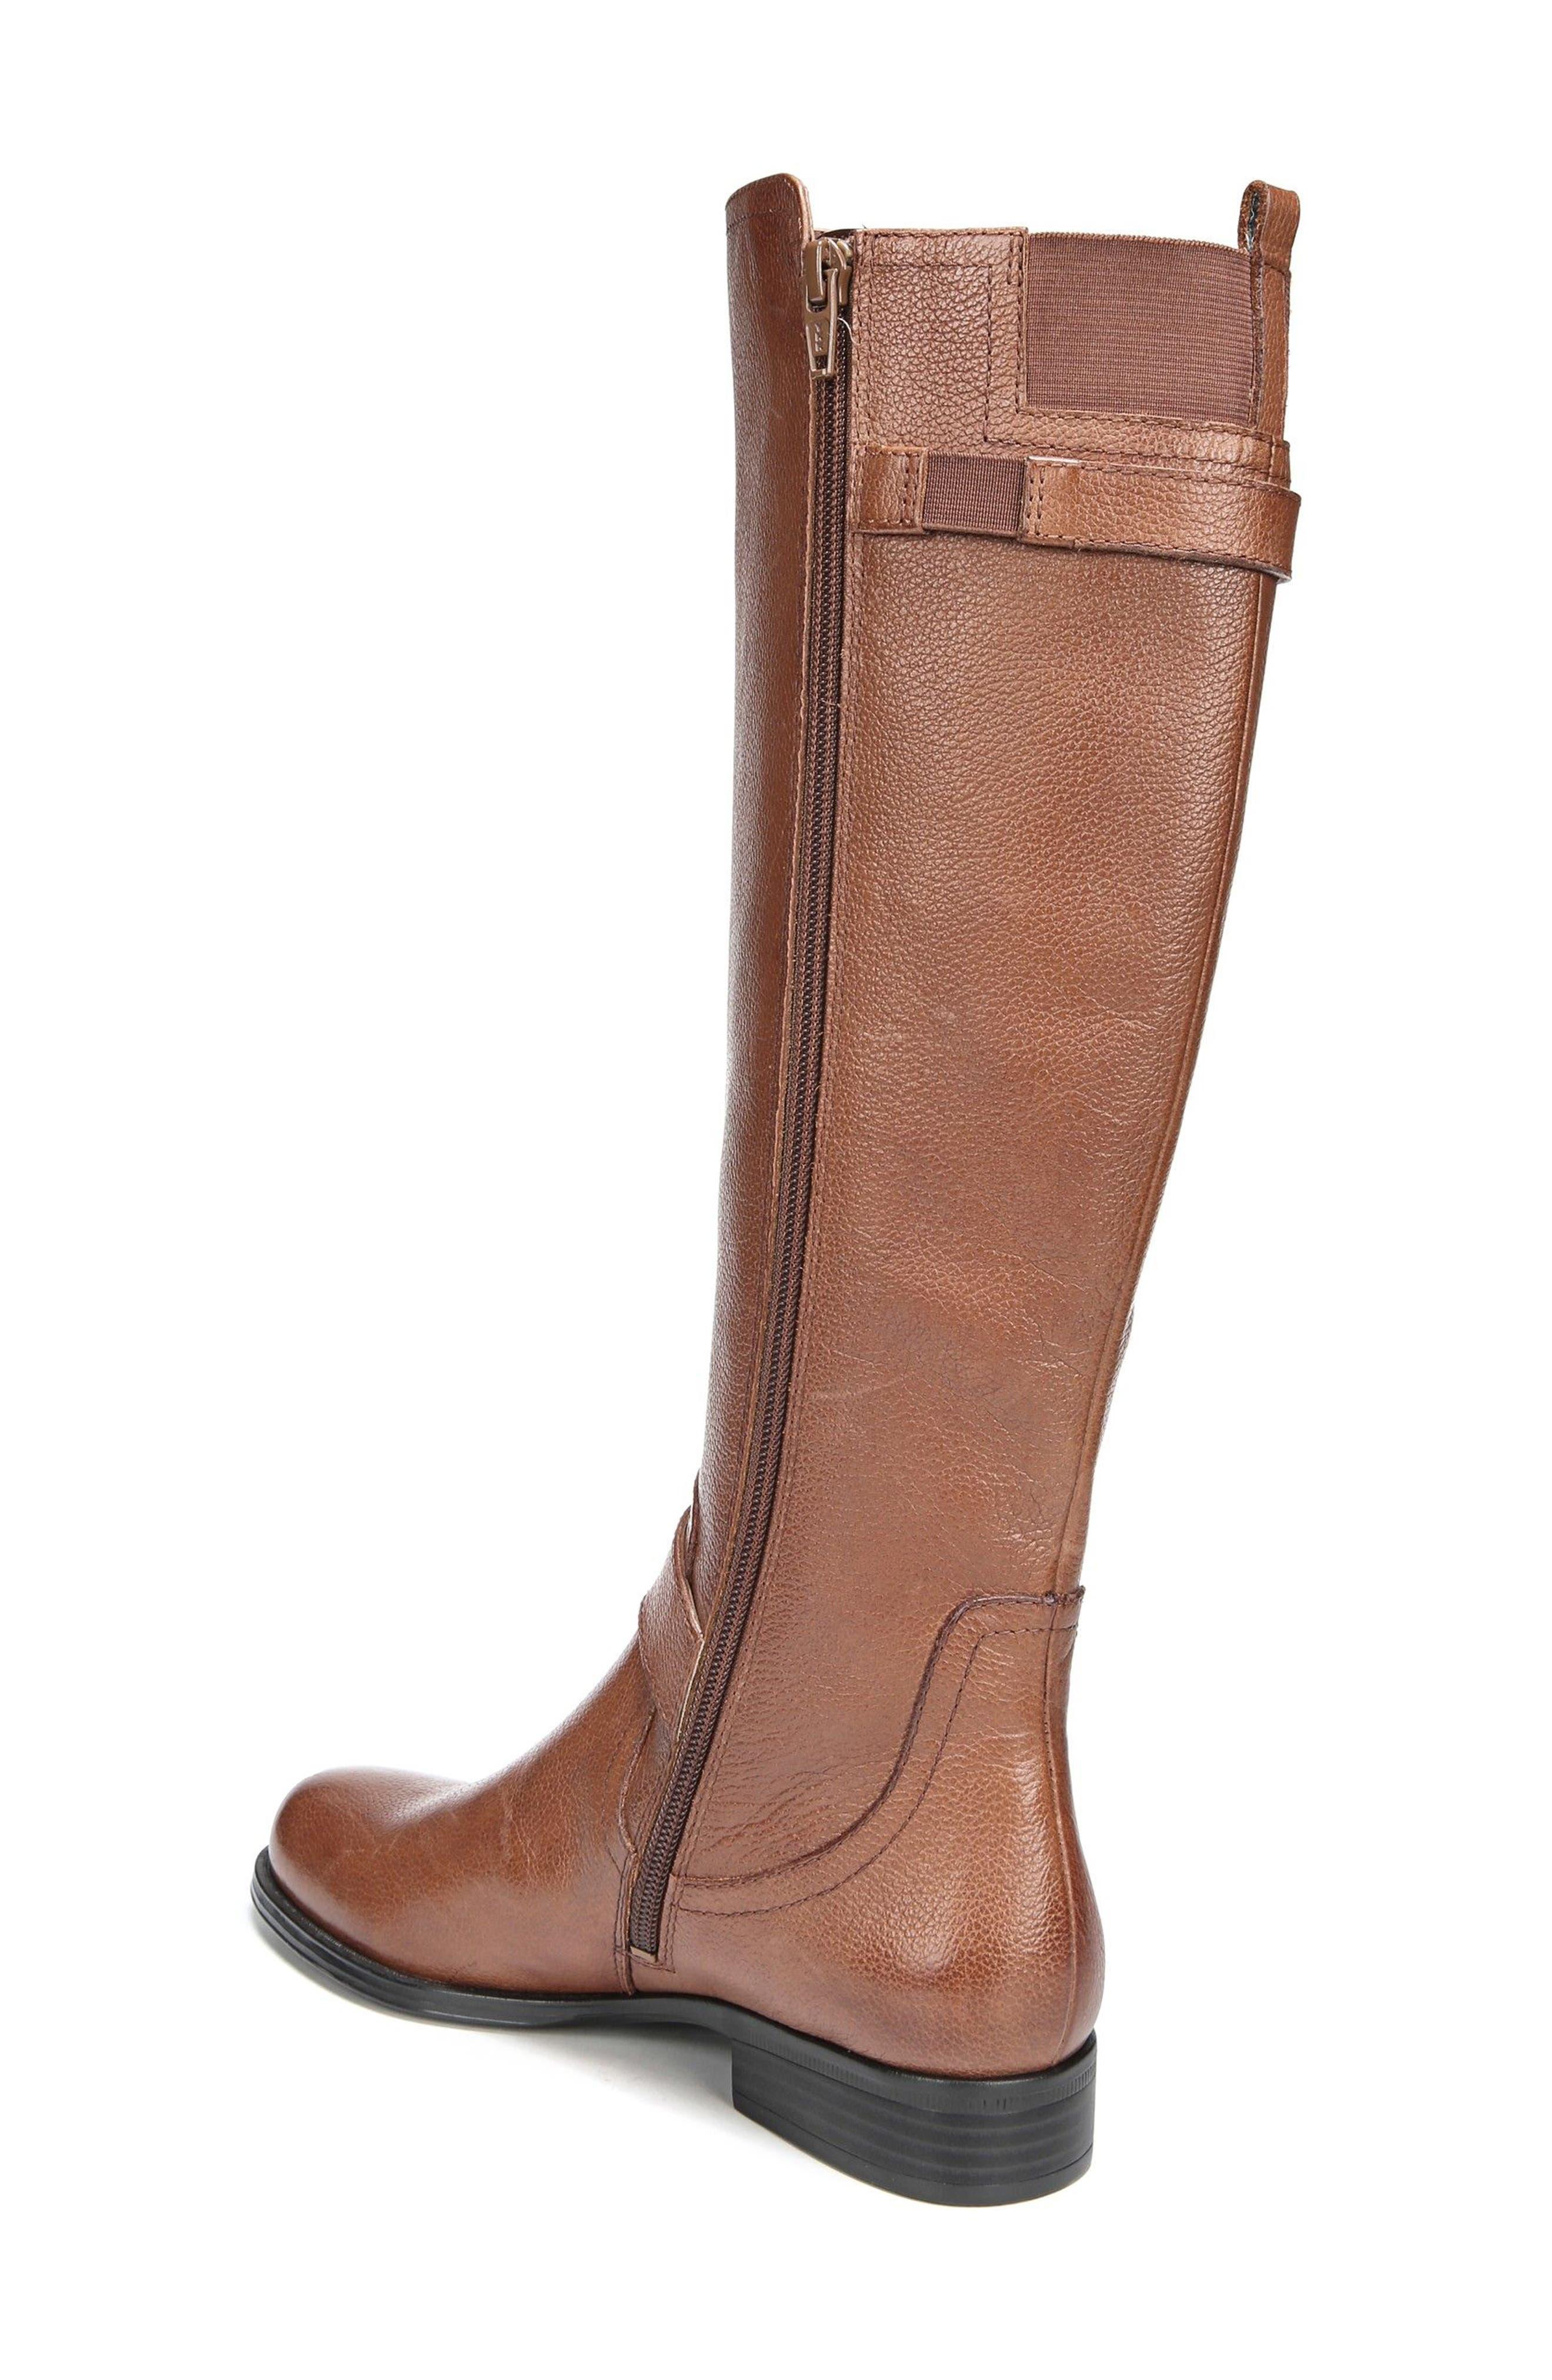 21de55f04984 naturalizer boots